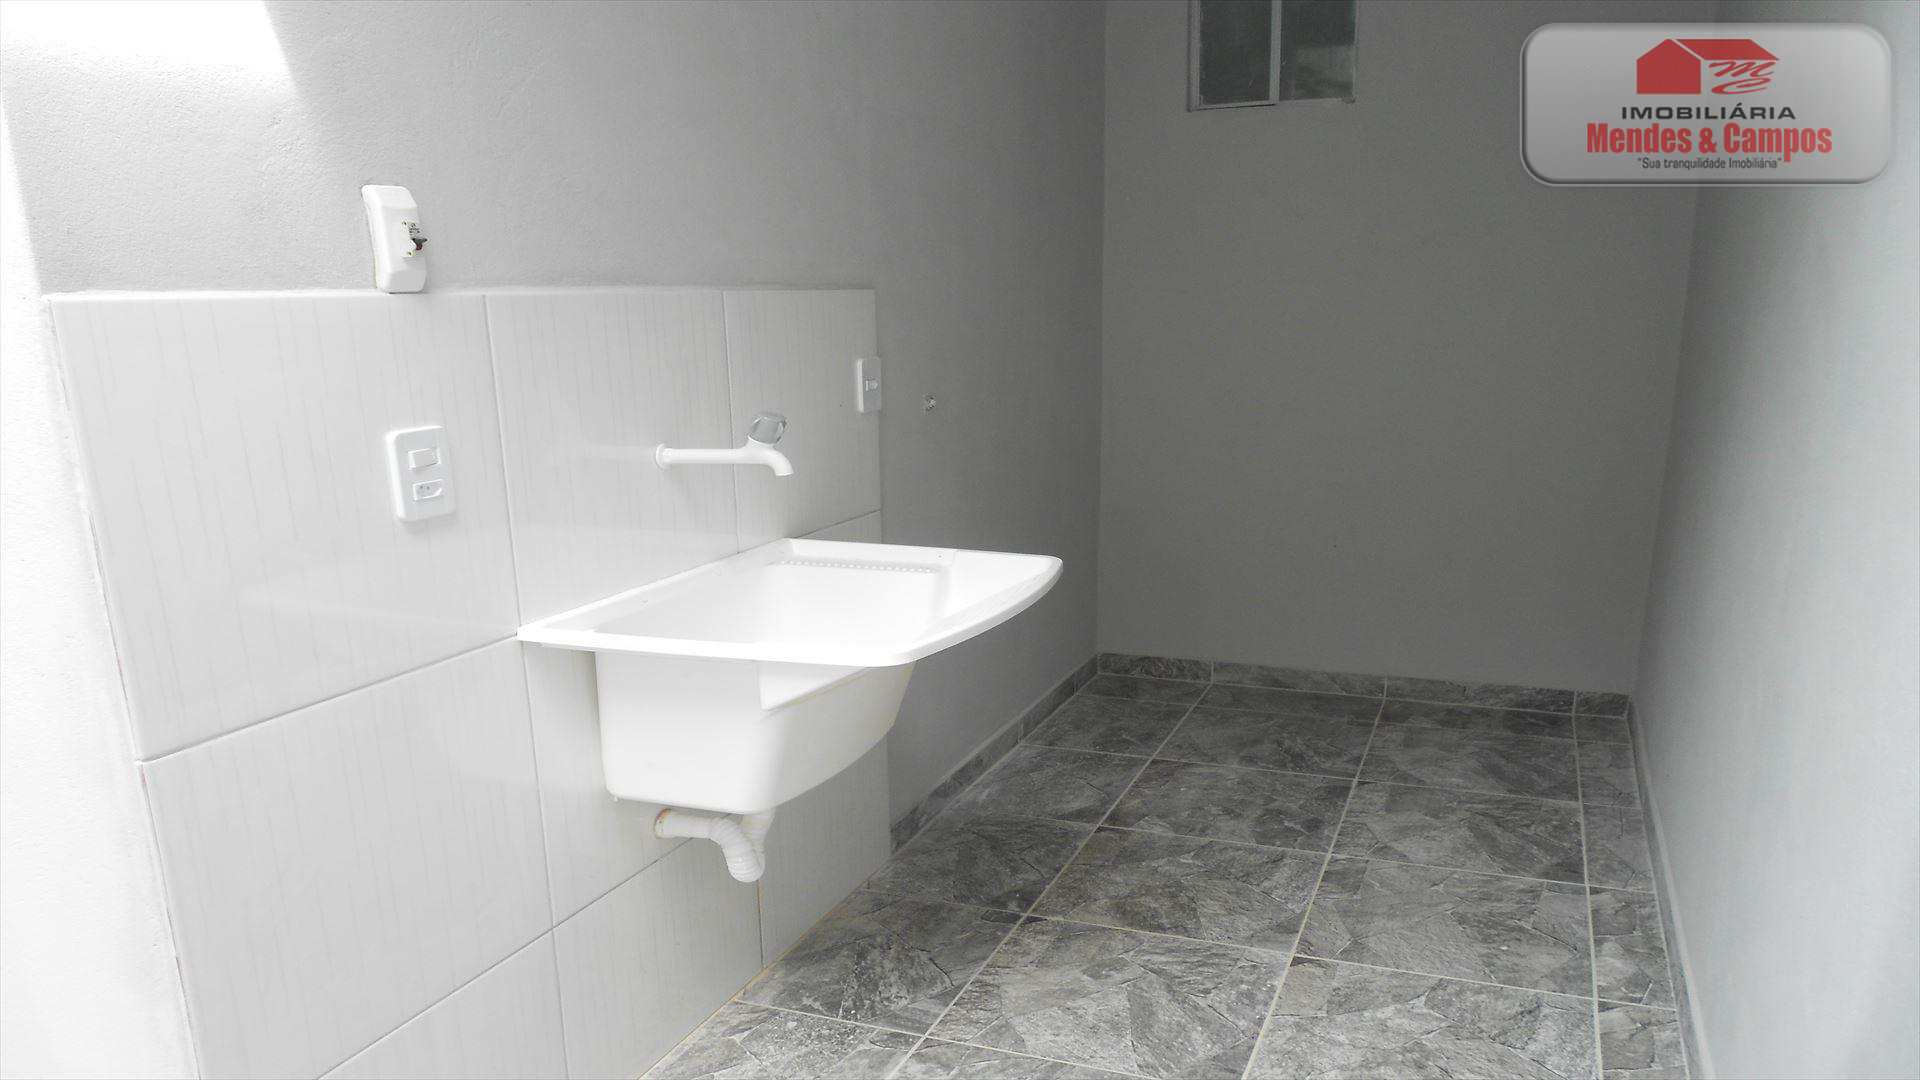 Rua Matão nº 2754 Jardim Paulista, Cod: 785